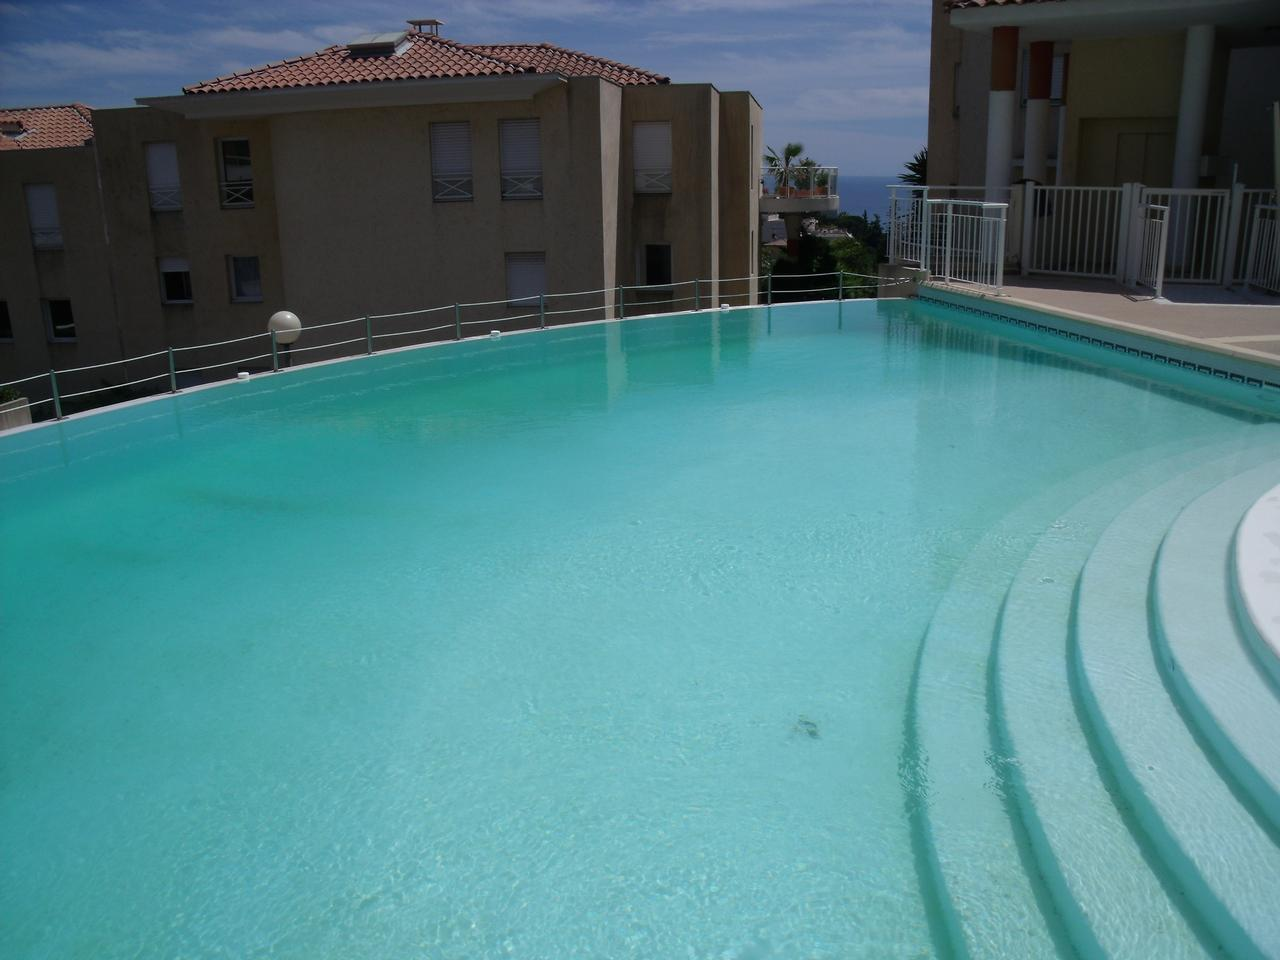 Immobilier nice vue mer appartement nice appartement avec vue mer et piscine a vendre corniche for Piscine vendeur